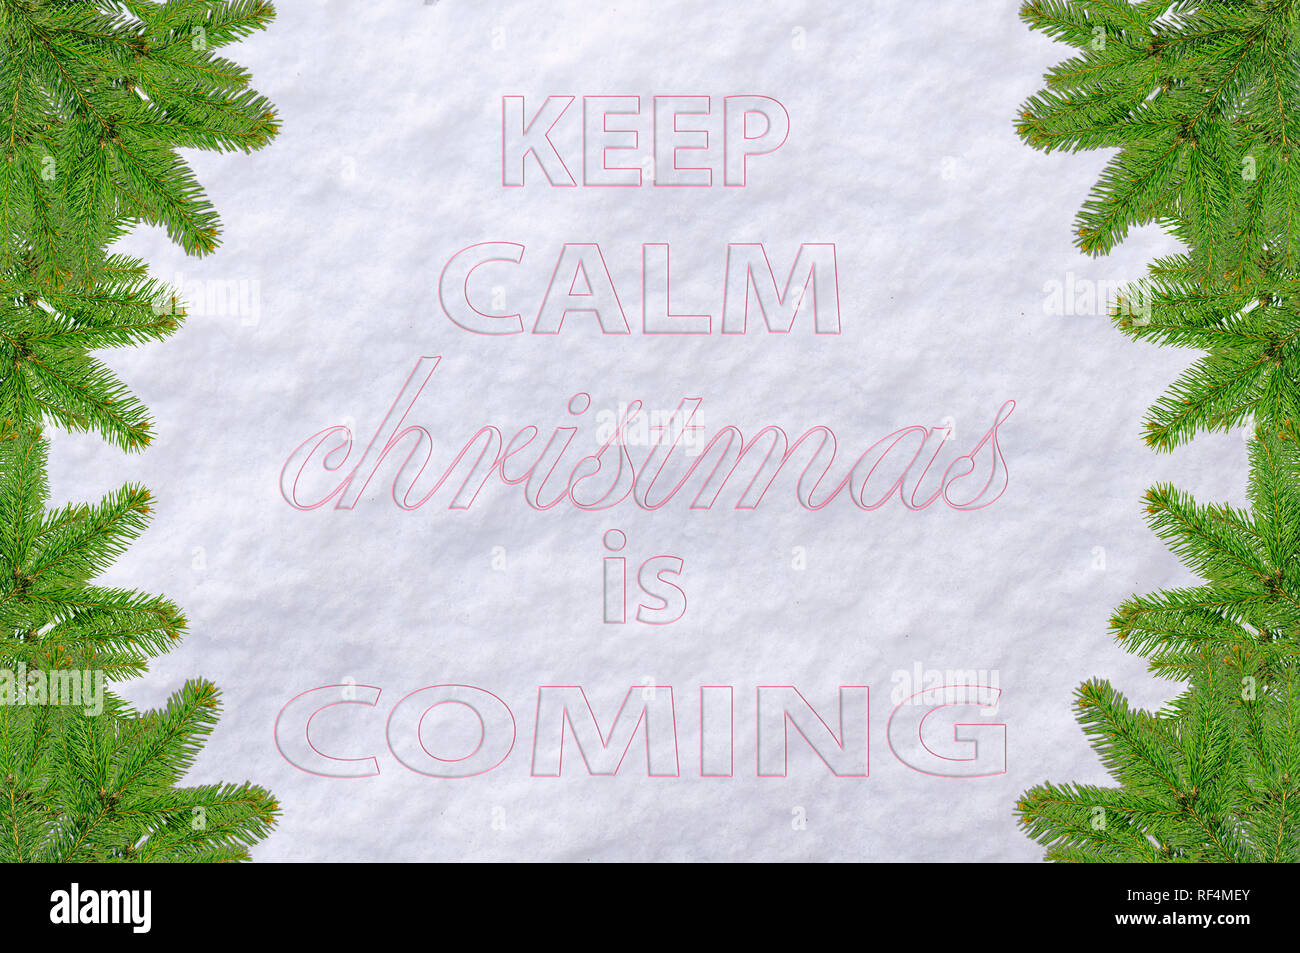 Keep Calm Christmas Is Coming.Keep Calm Christmas Is Coming Pine Tree And Snow Surface